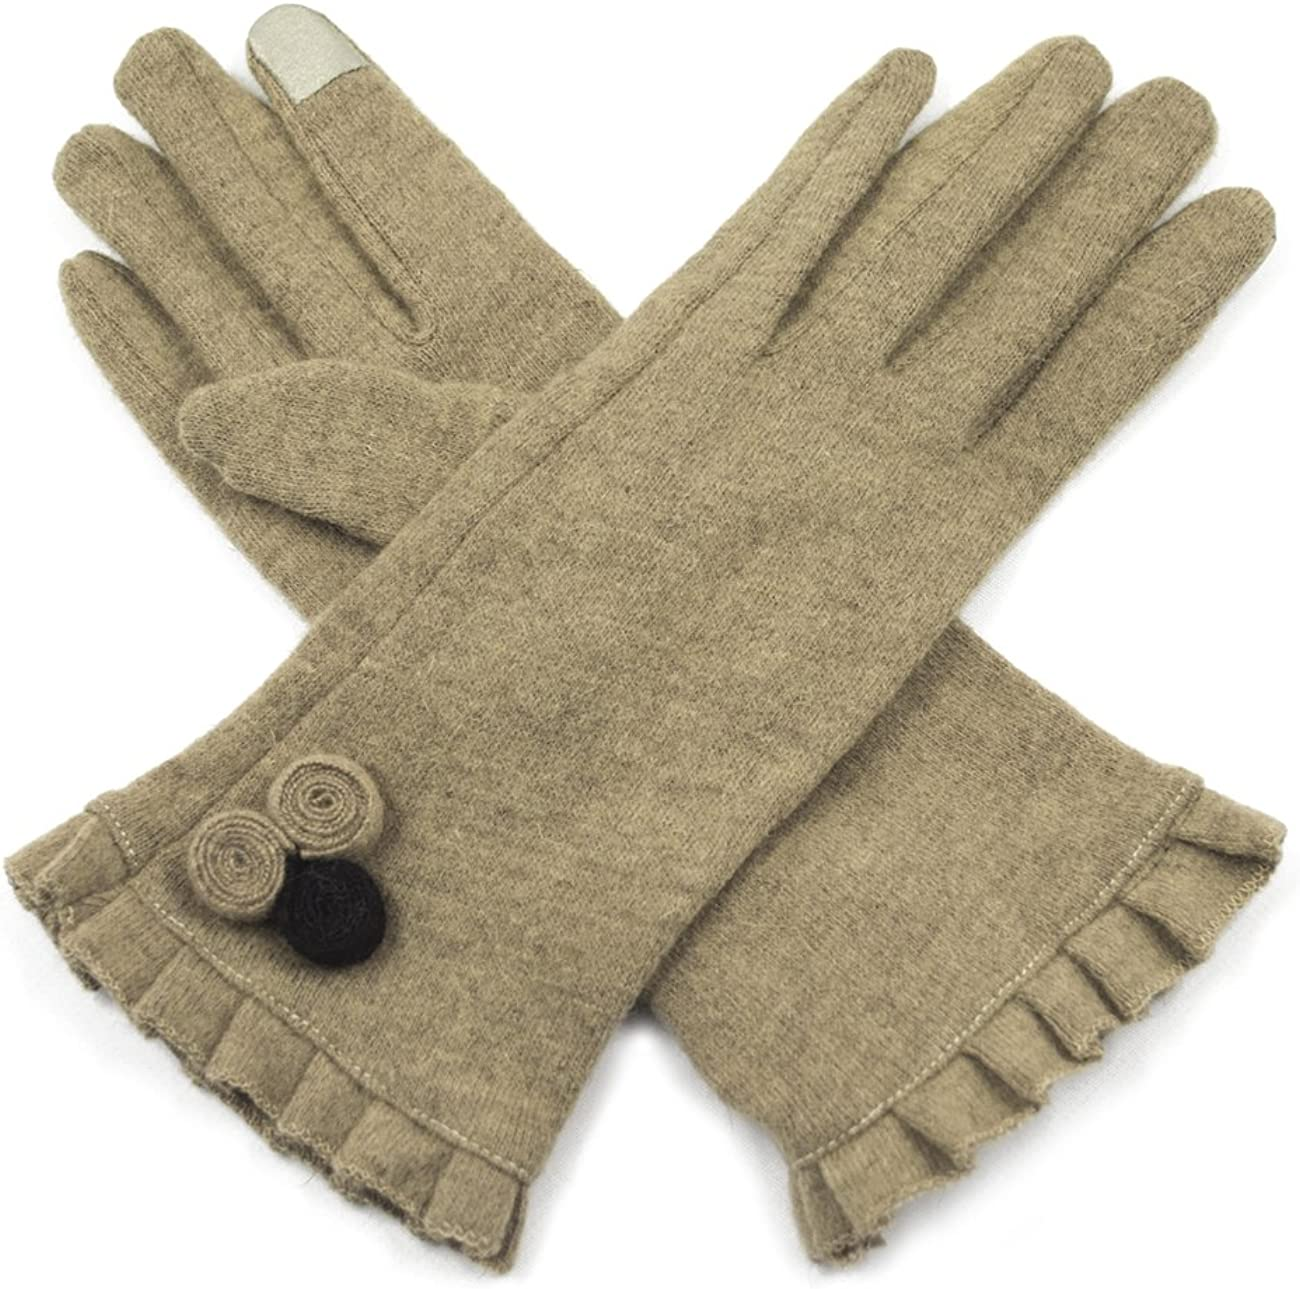 Dahlia Touchscreen Gloves for Women - Fleece Lined & Single Layer Winter Gloves